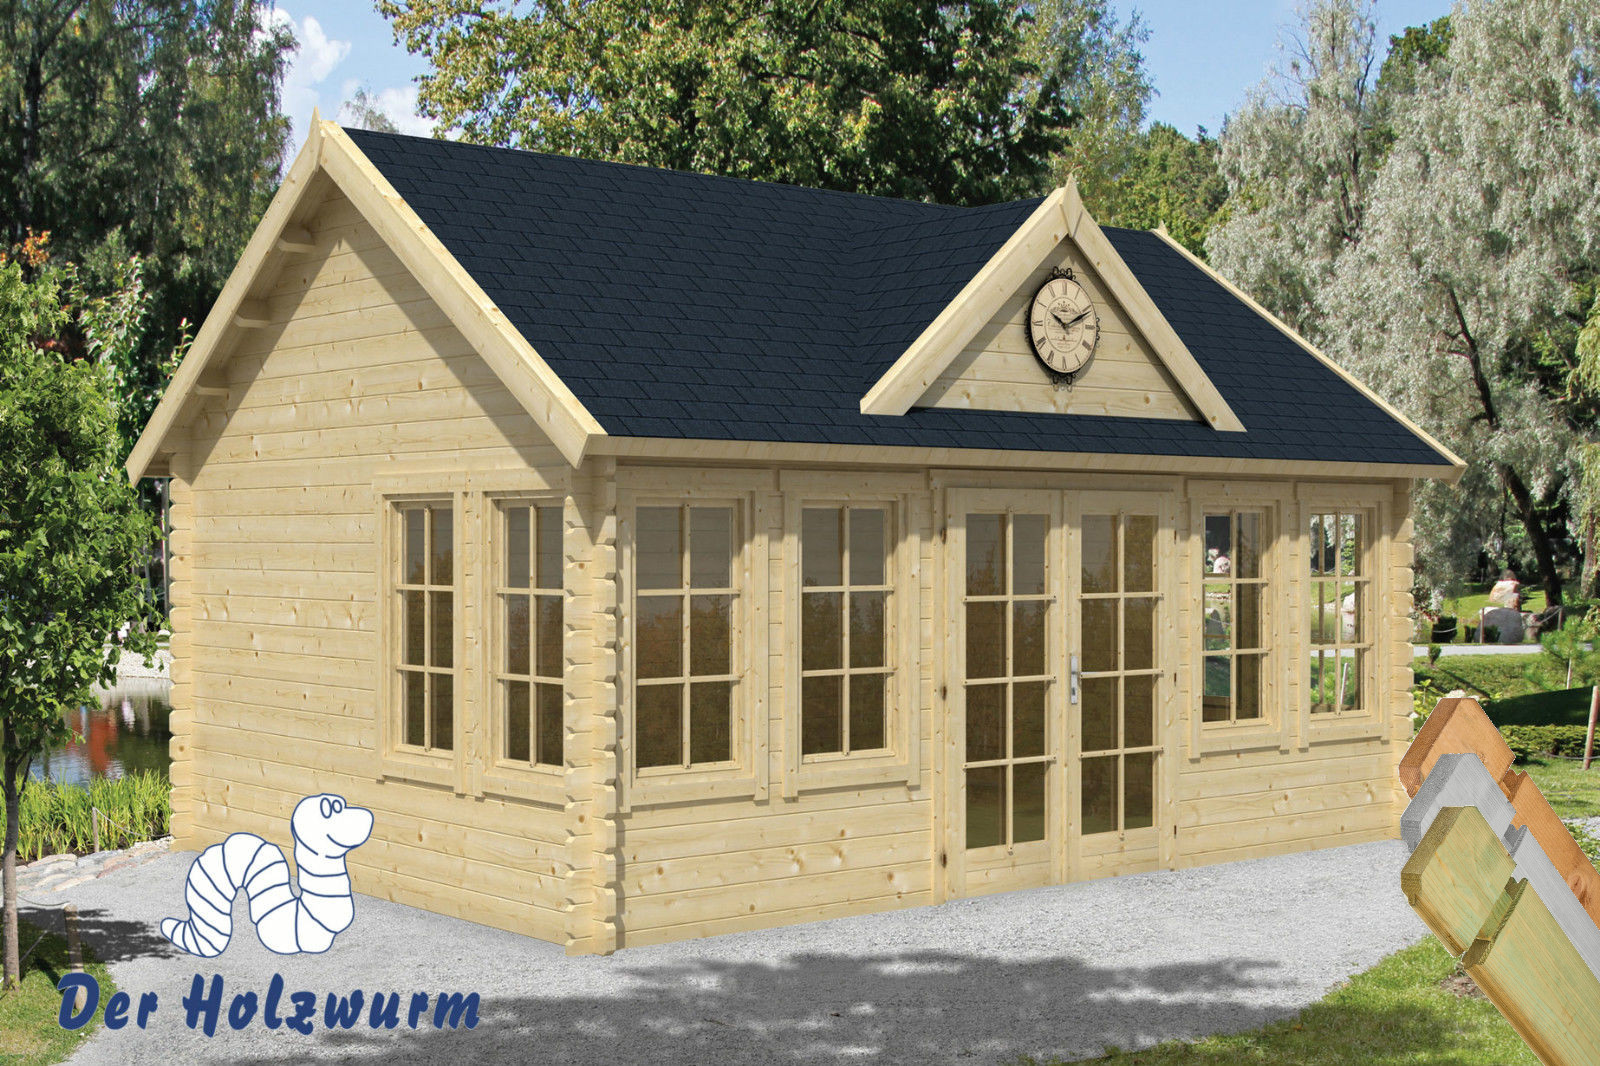 gartenhaus clockhouse 44 mm ca 550x400 cm holzwurm obersayn. Black Bedroom Furniture Sets. Home Design Ideas